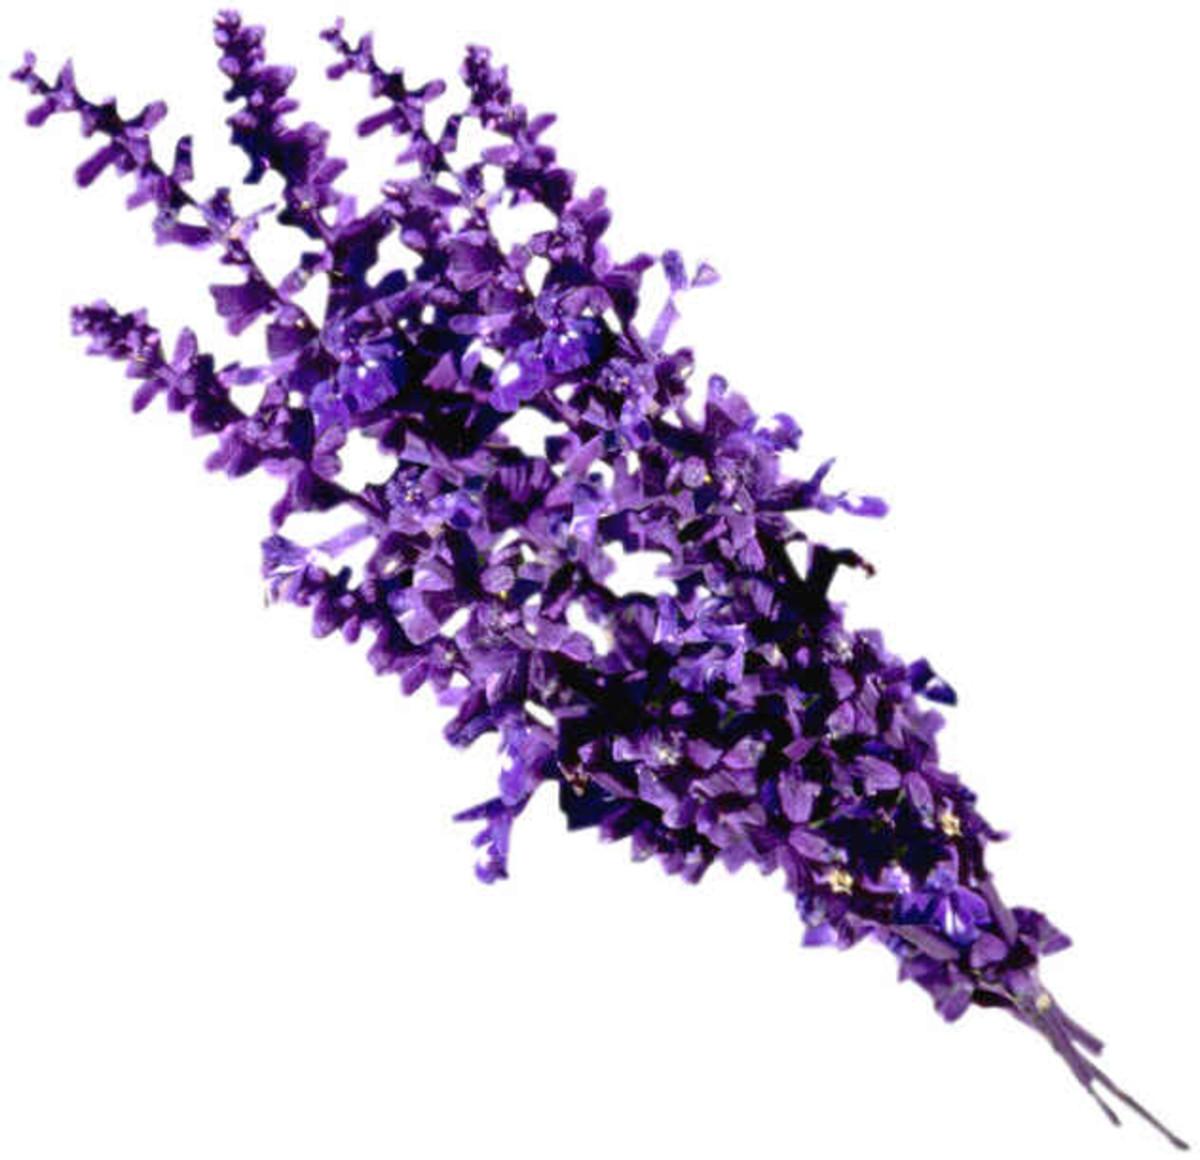 Top 10 Lavender Perfumes for Men - Best Fragrances for Males